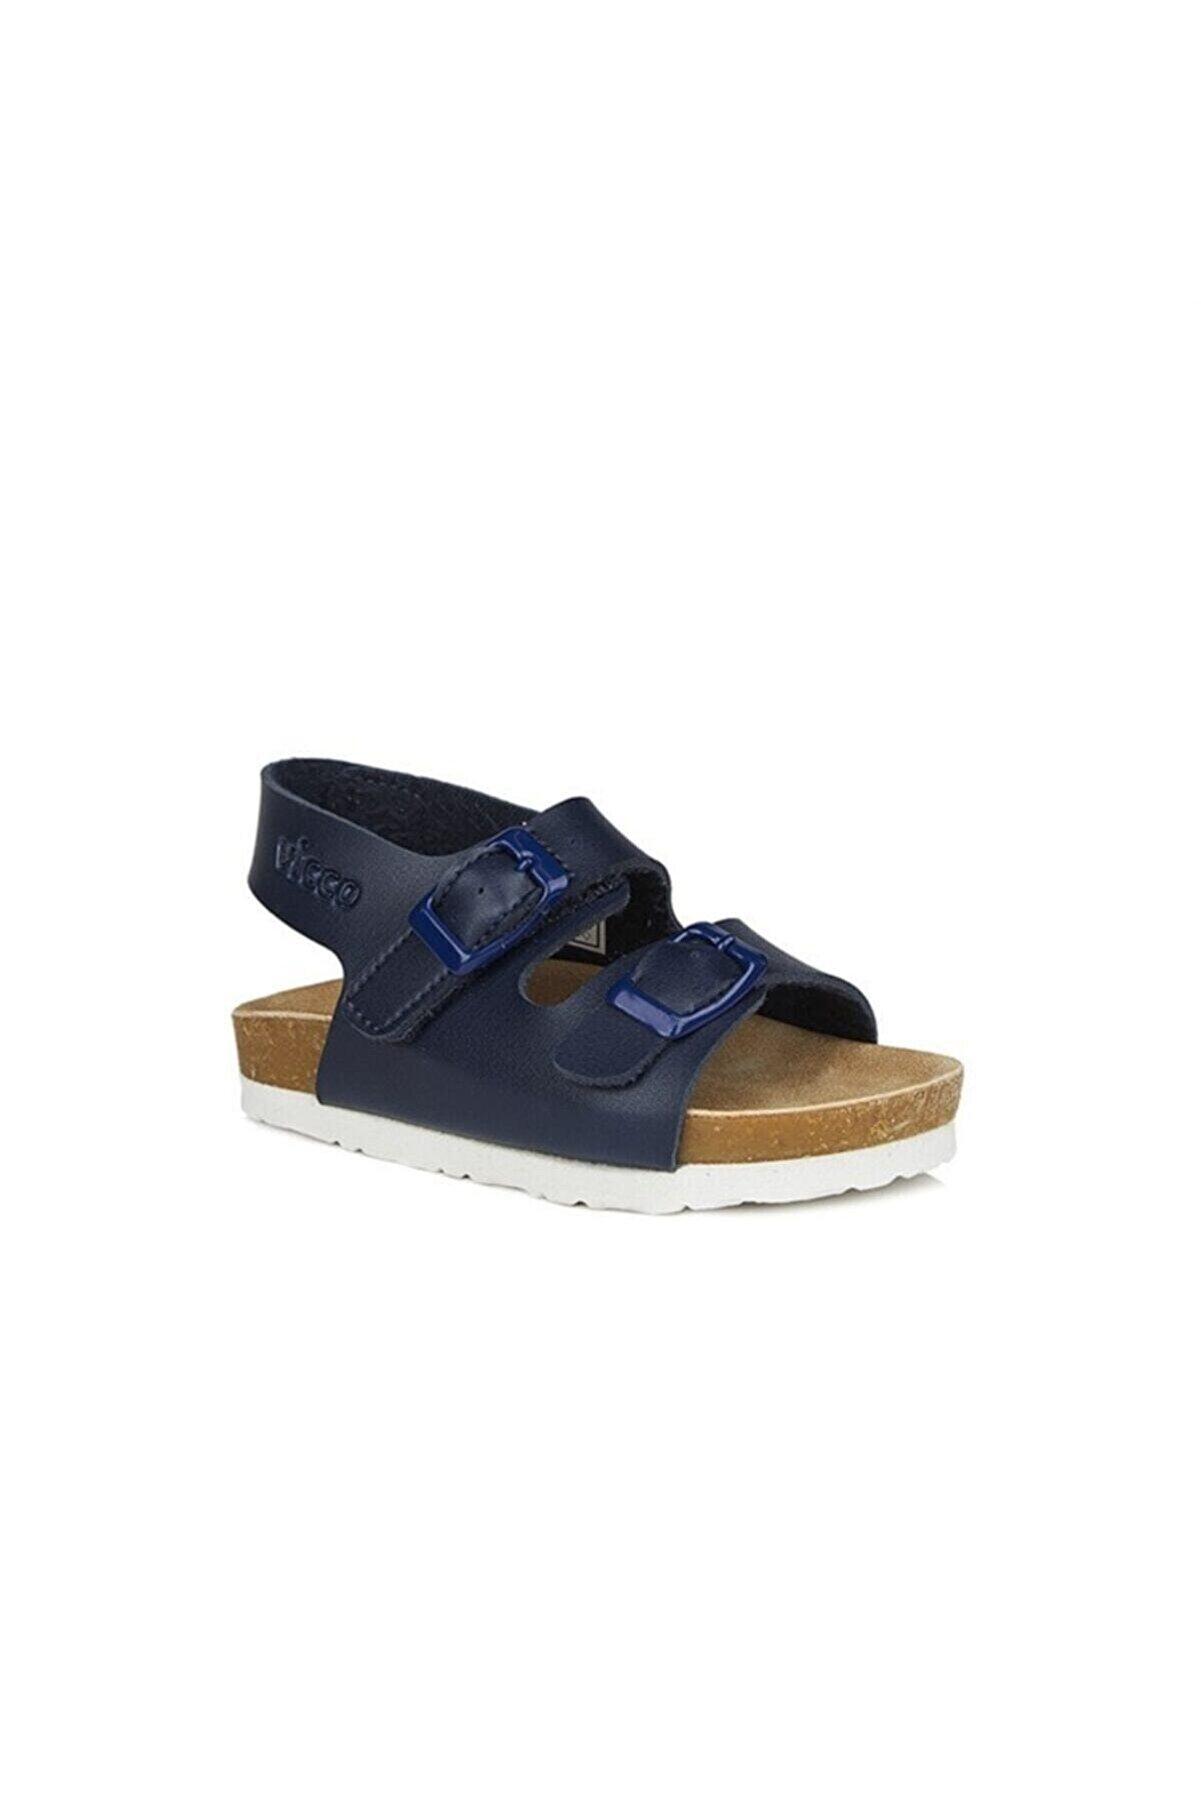 Vicco 321.B20Y.360 Lacivert Erkek Çocuk Sandalet 100579022